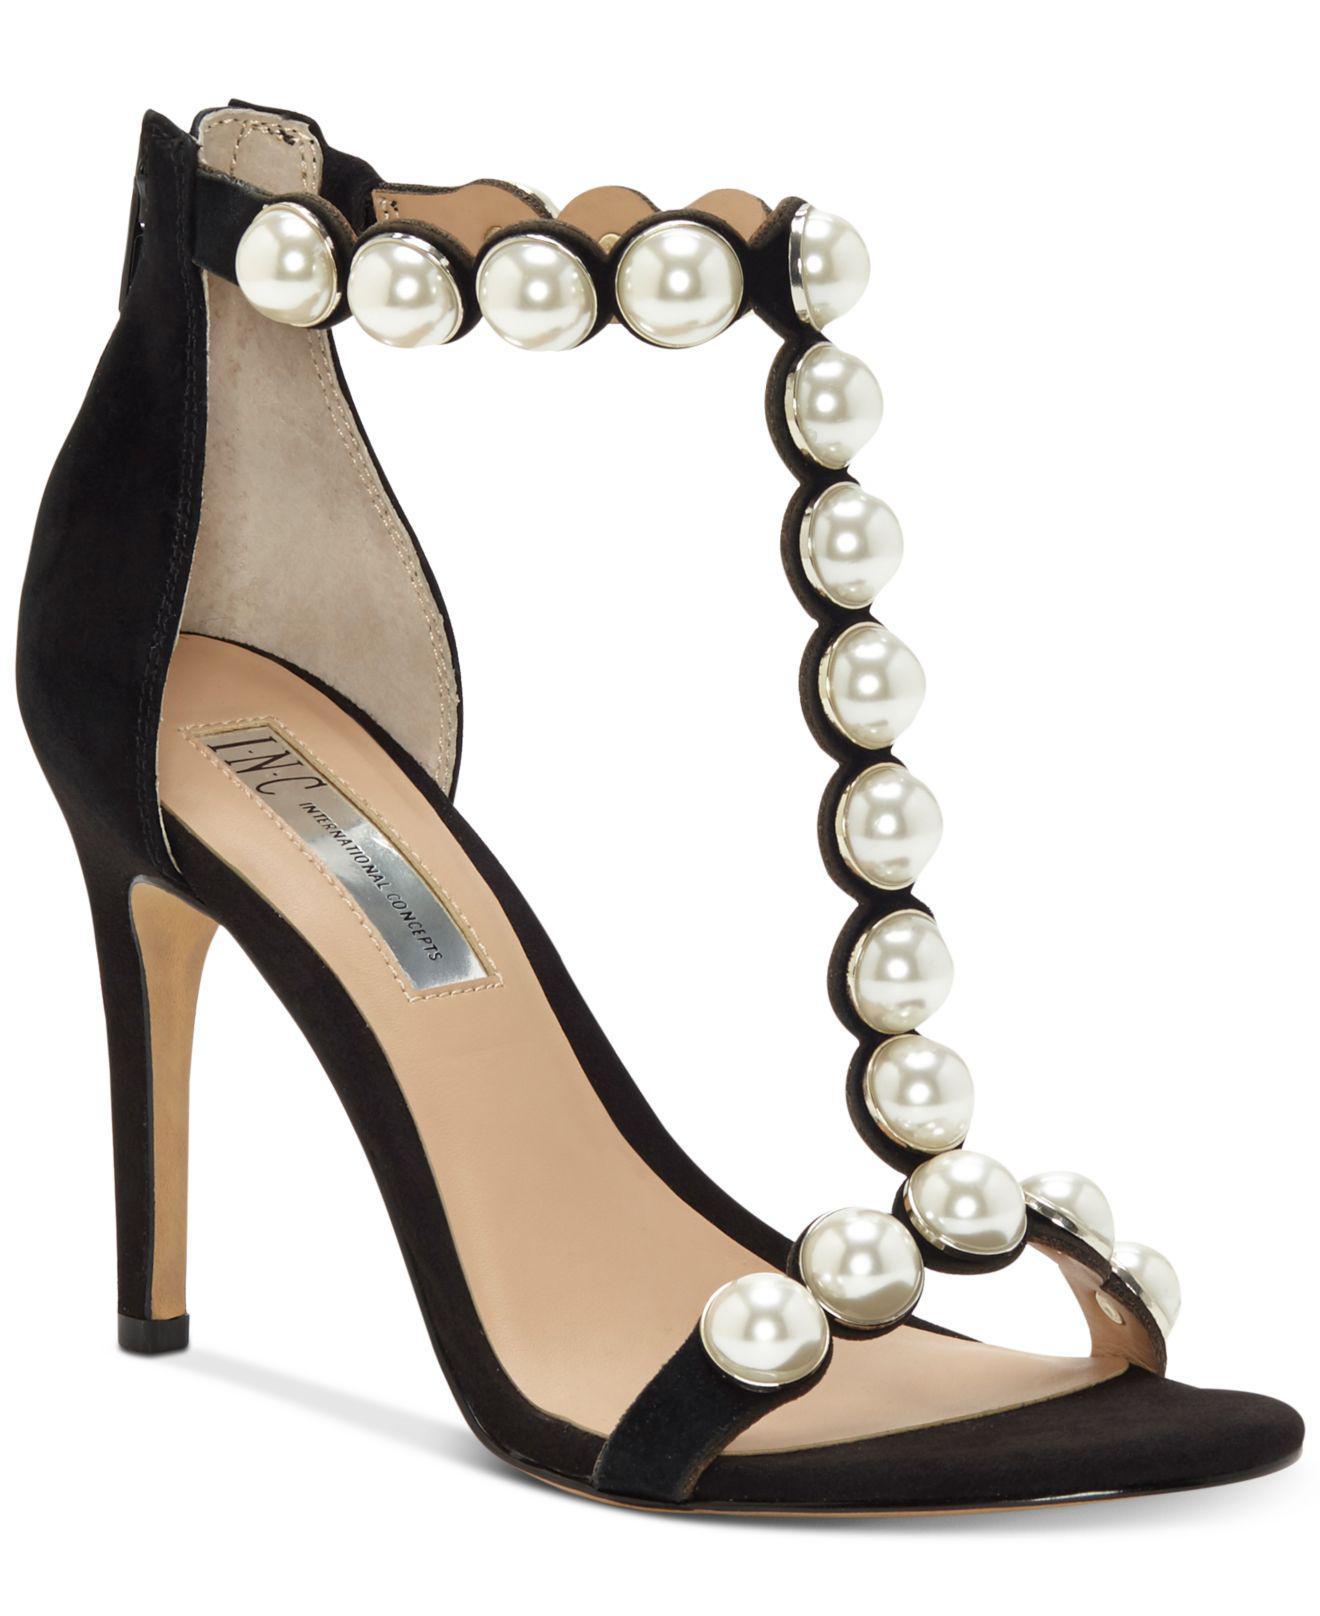 f791bc8ff INC International Concepts. Women s Black Raechelle T-strap Dress Sandals